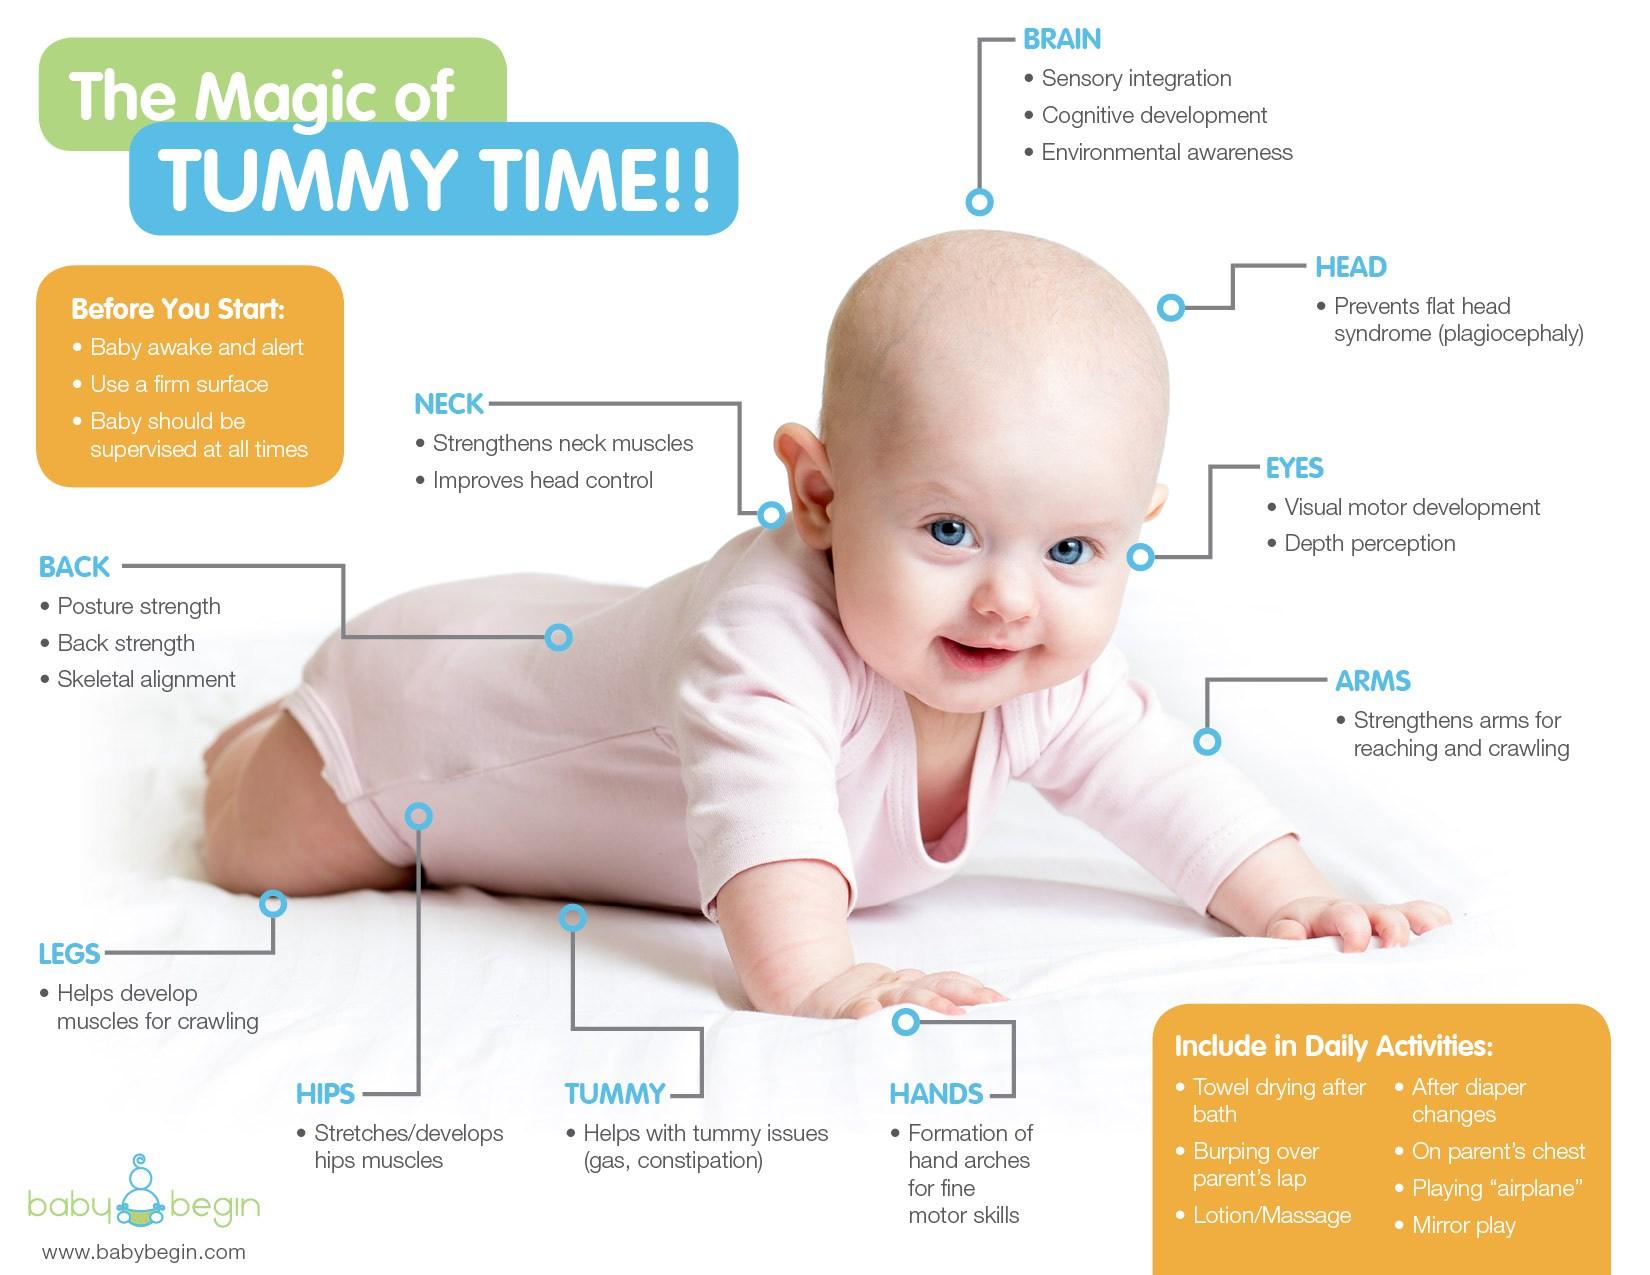 tummy-time-infographic.jpg